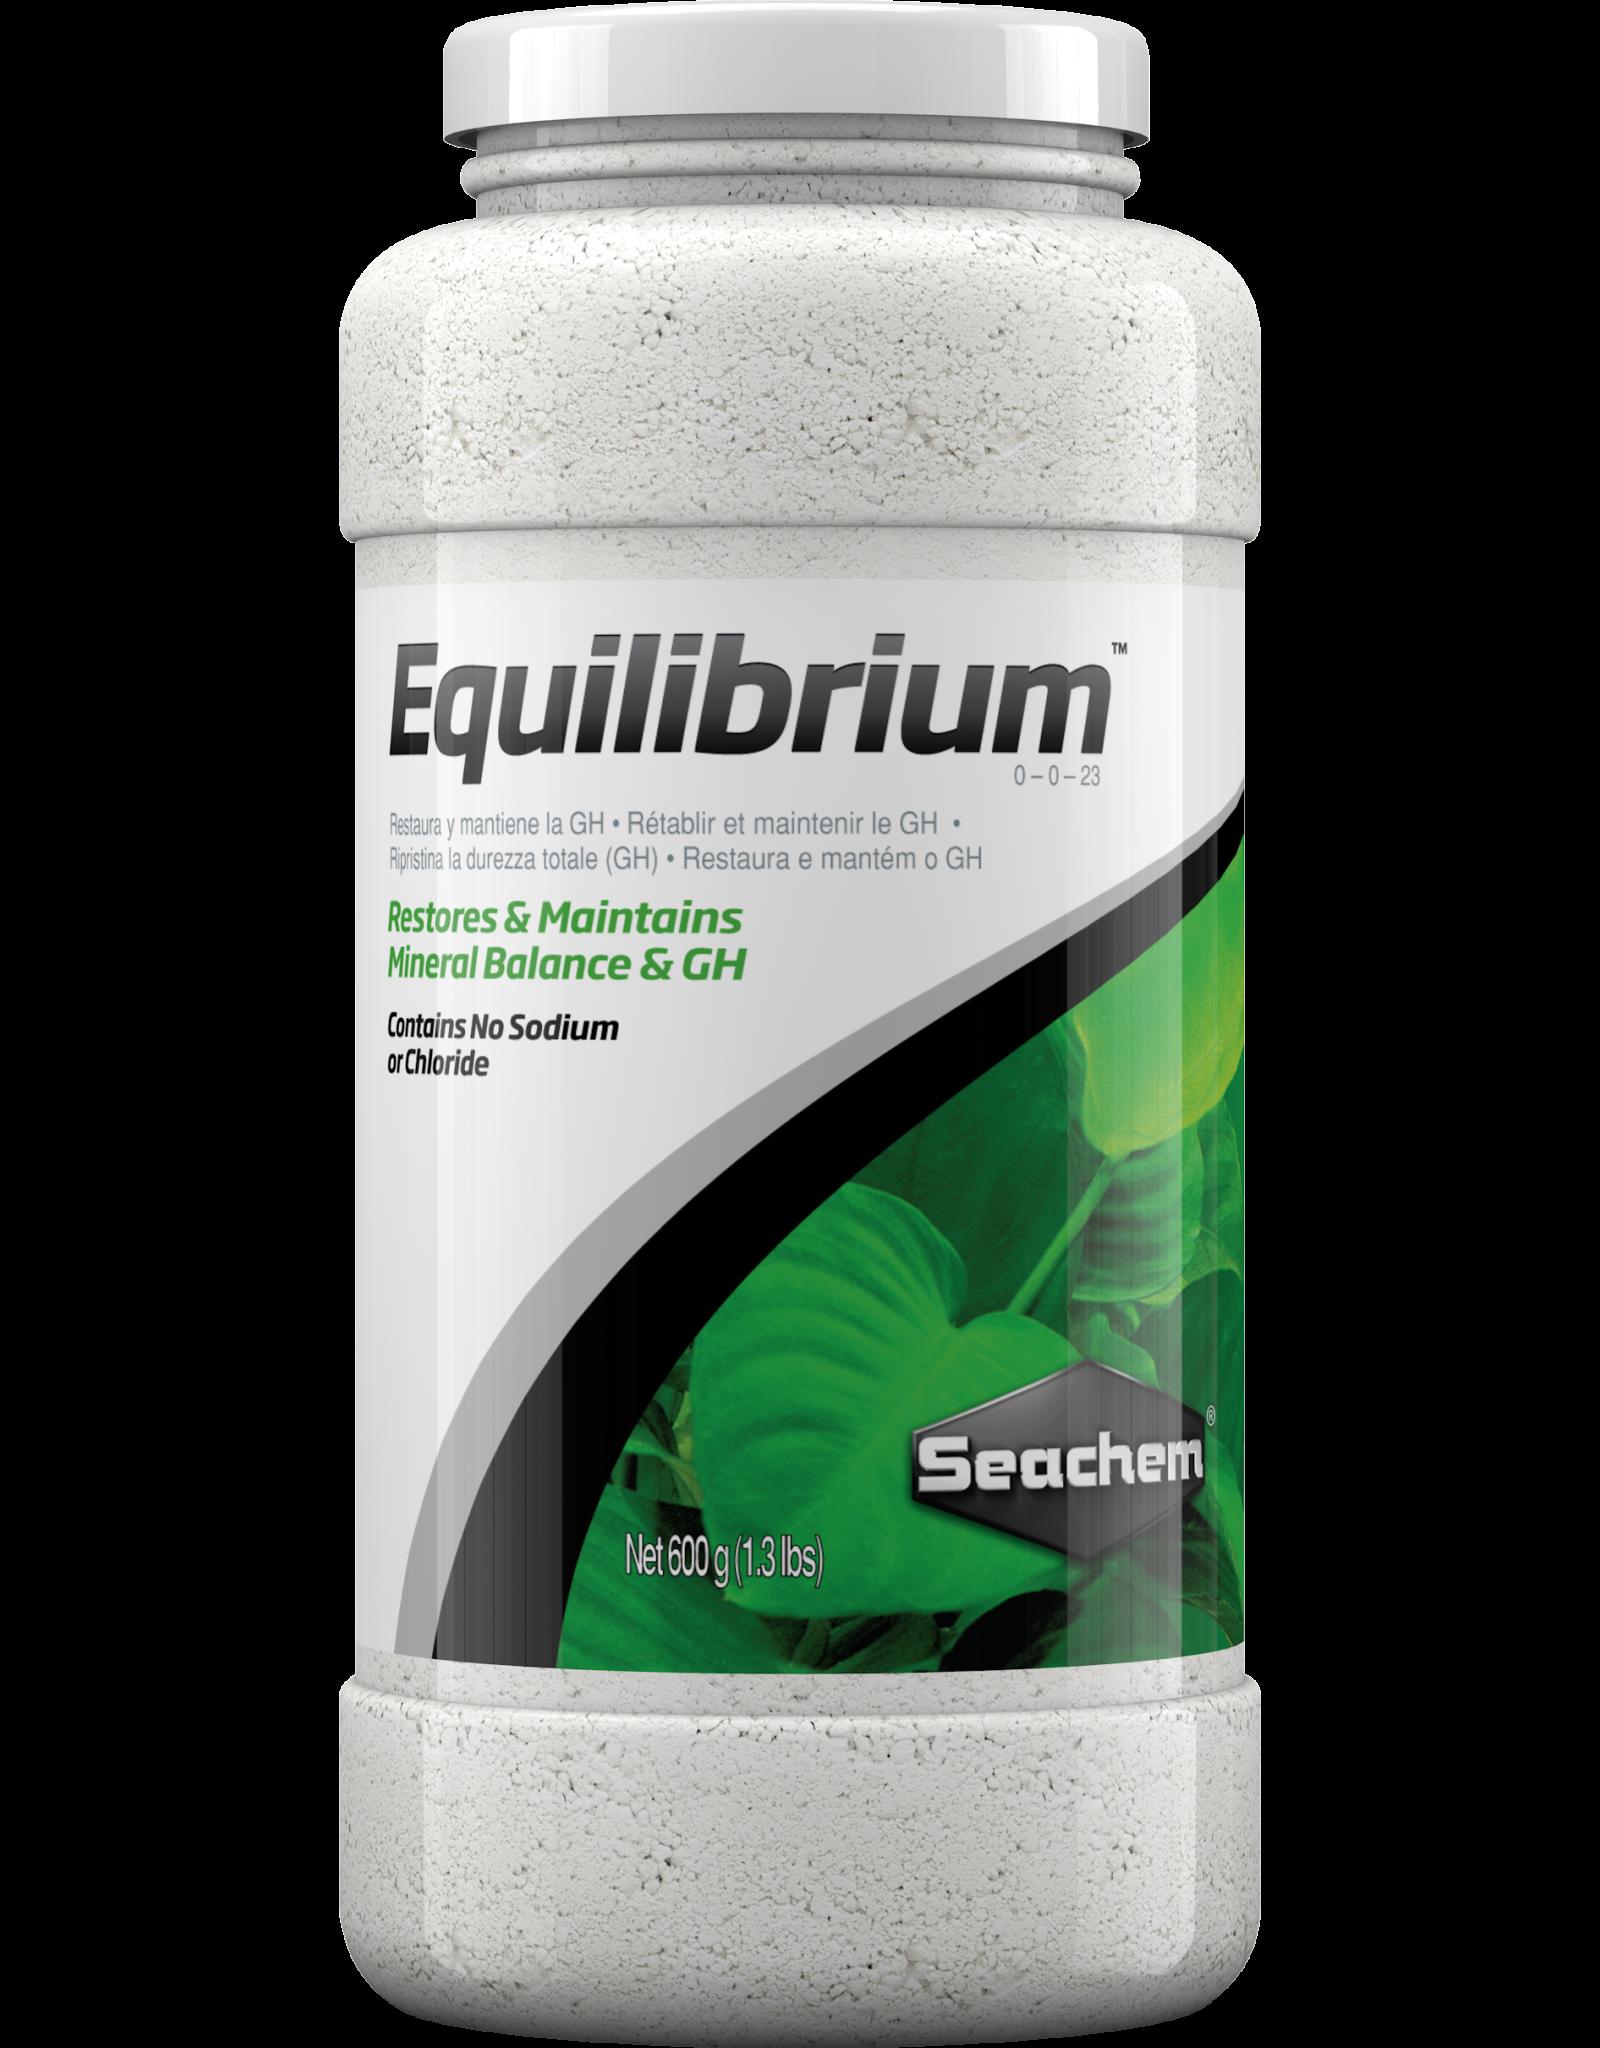 Seachem SEACHEM Equilibrium